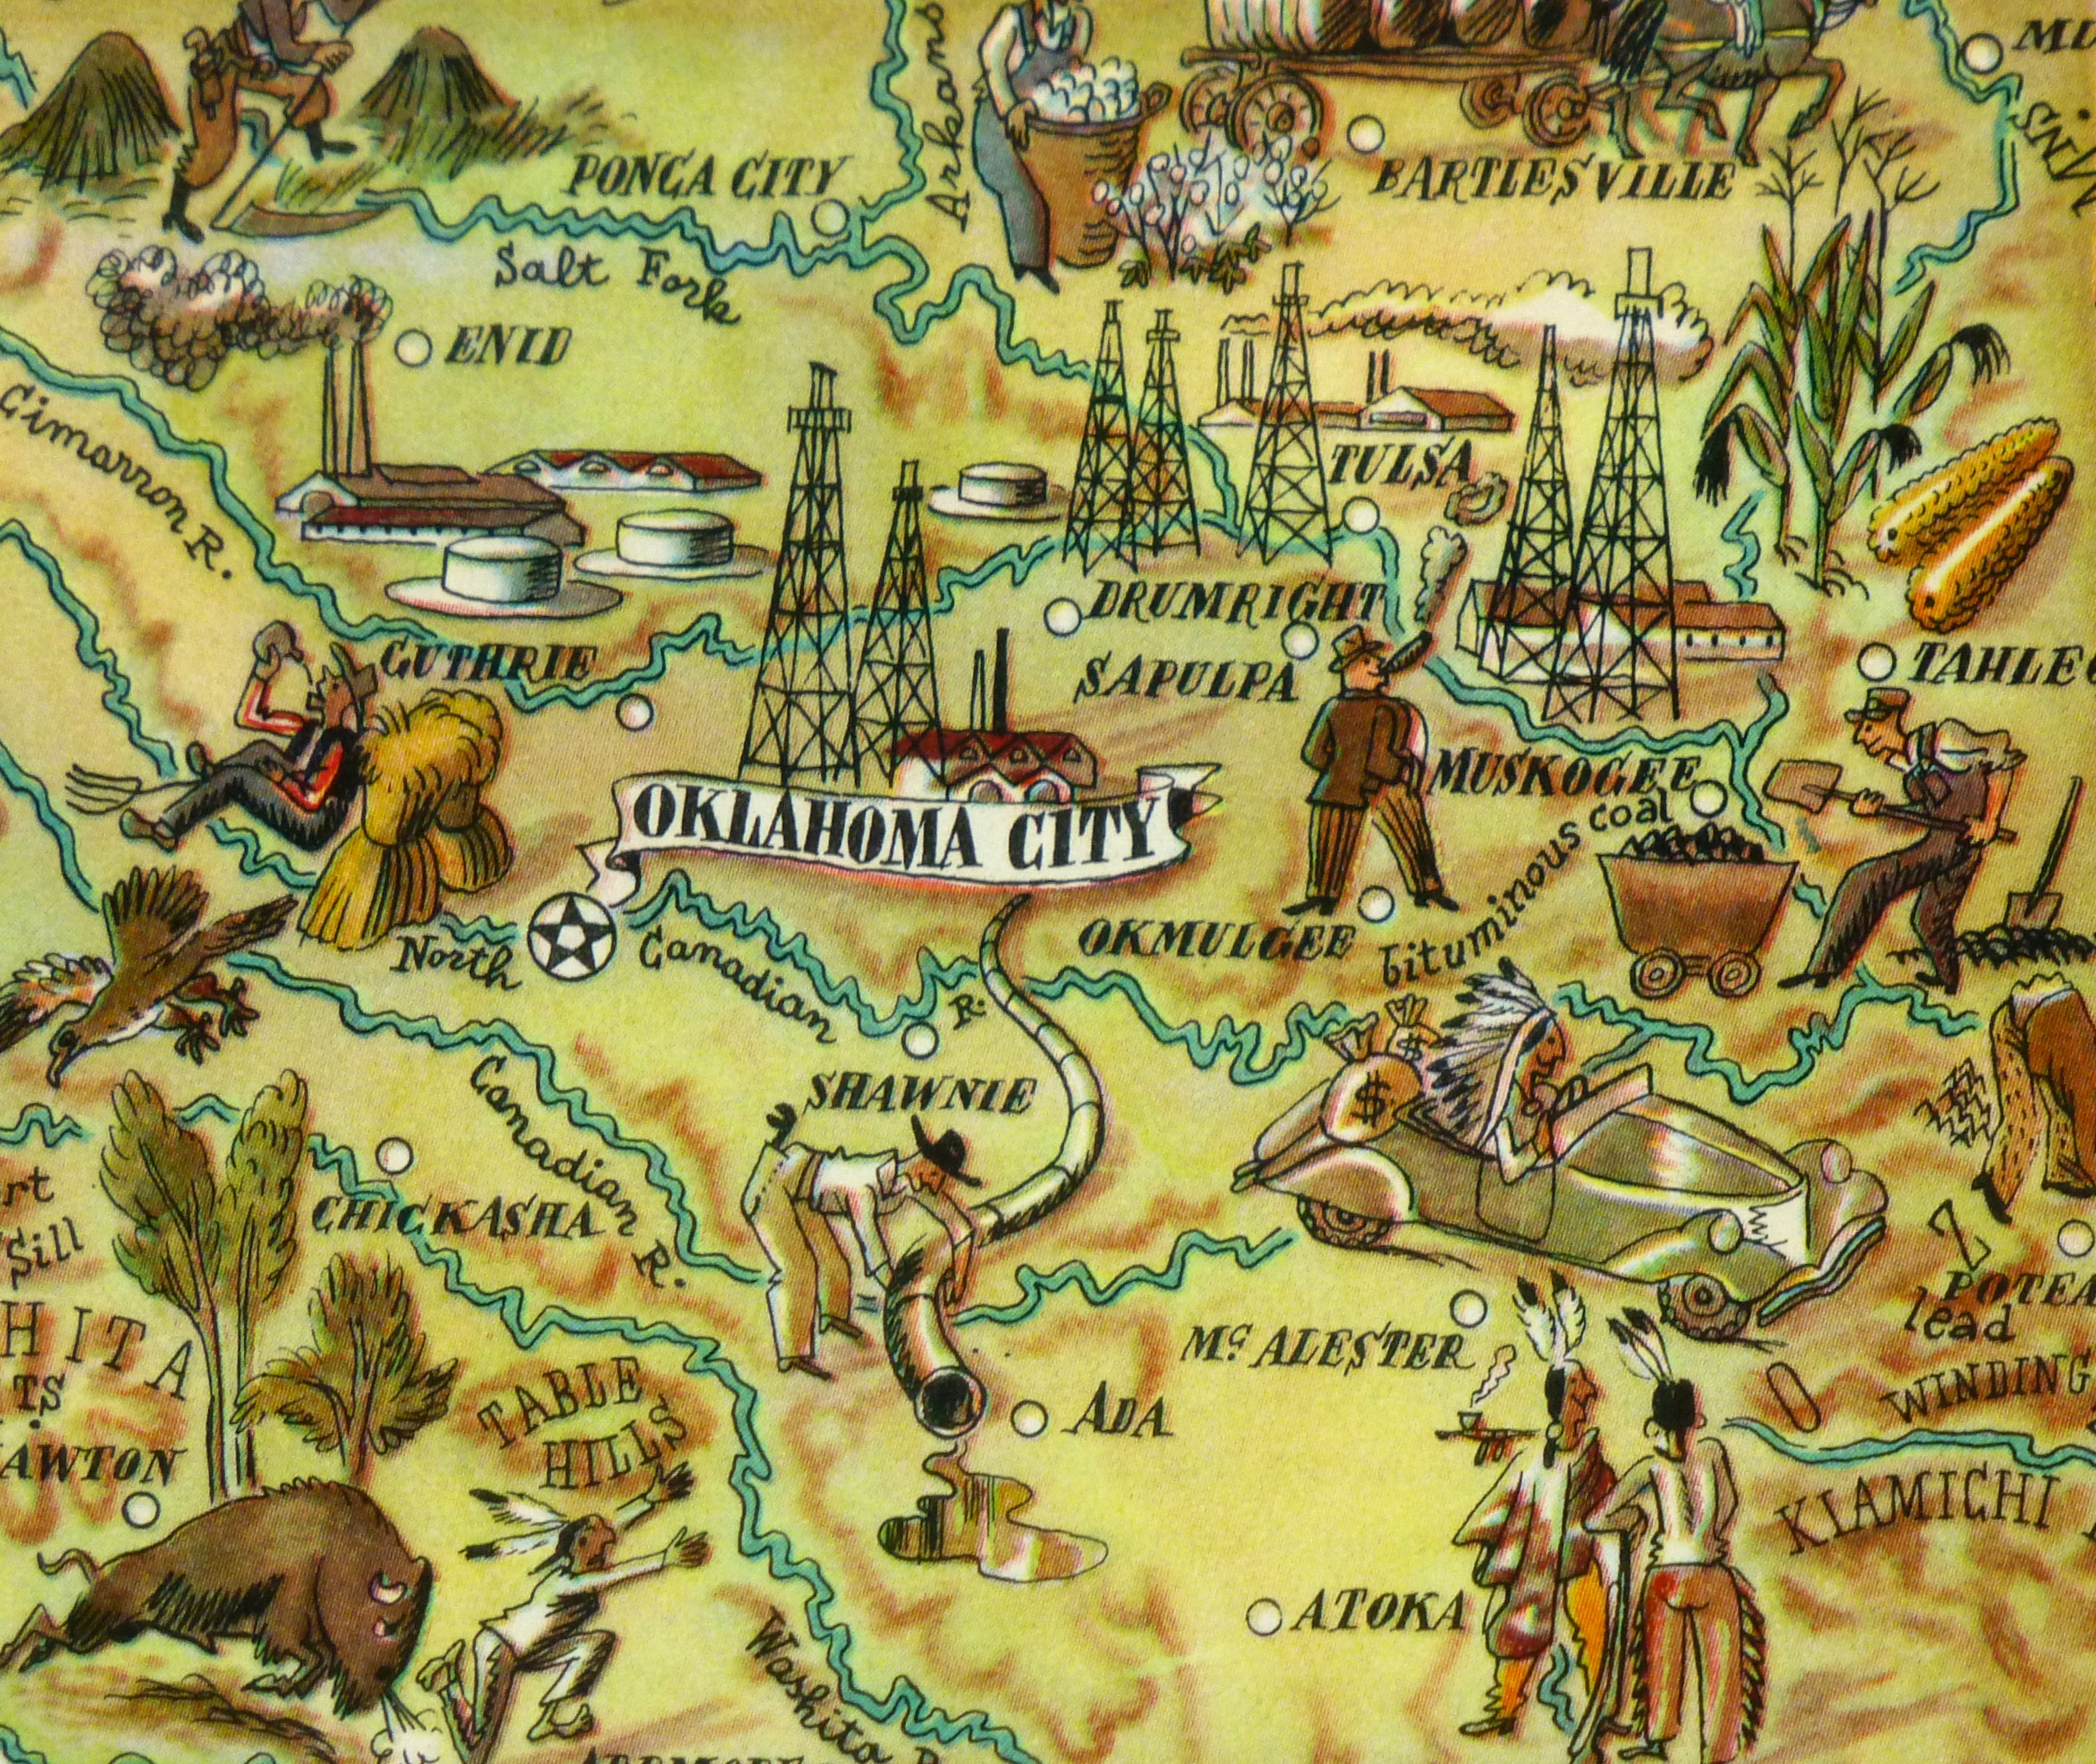 Oklahoma Pictorial Map, 1946-detail-6264K